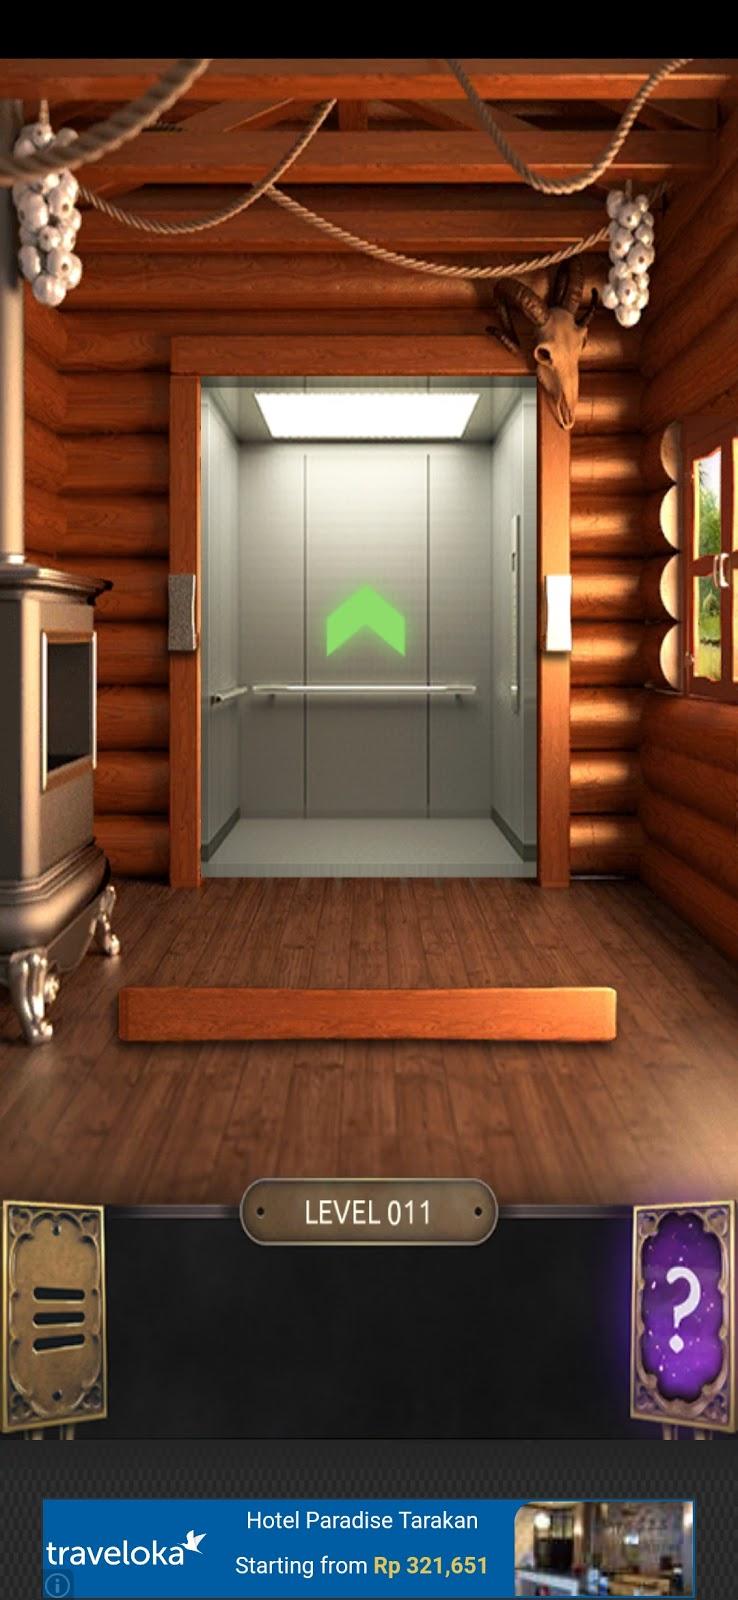 Kunci Jawaban 100 Doors Game Escape From School : kunci, jawaban, doors, escape, school, Doors, Challenge, Level, Answer